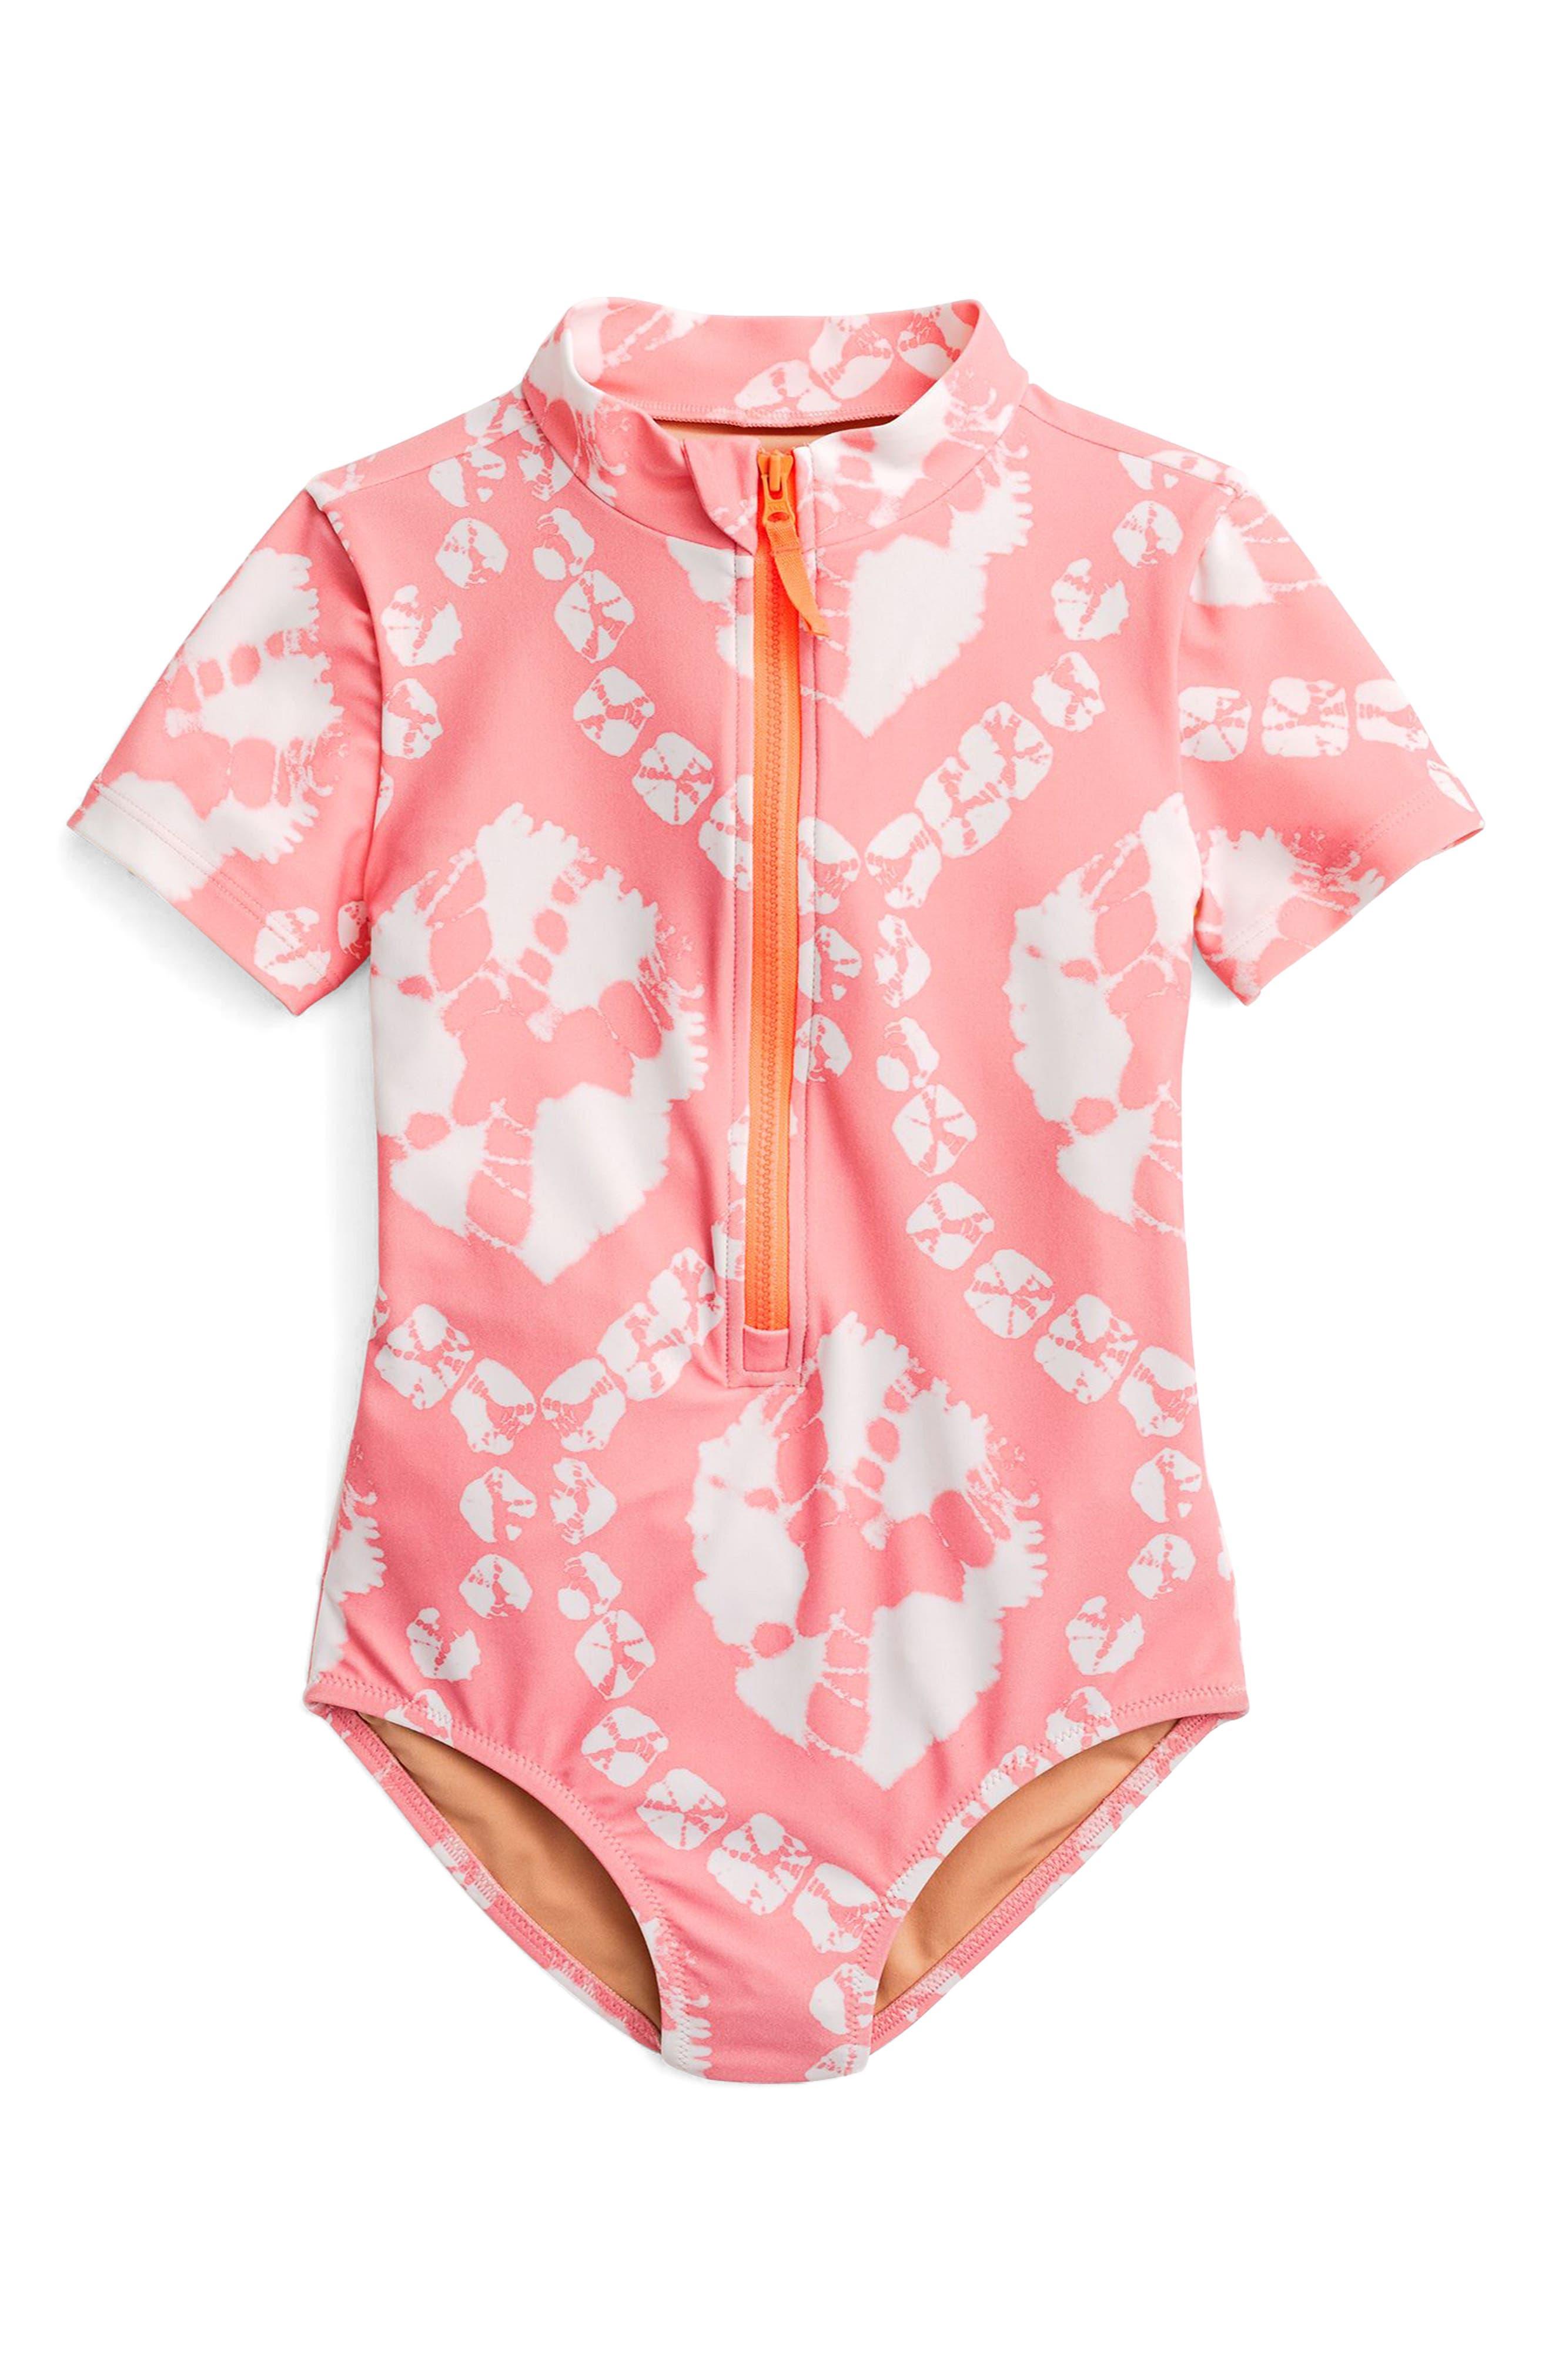 Tie Dye One-Piece Rashguard Swimsuit,                         Main,                         color,